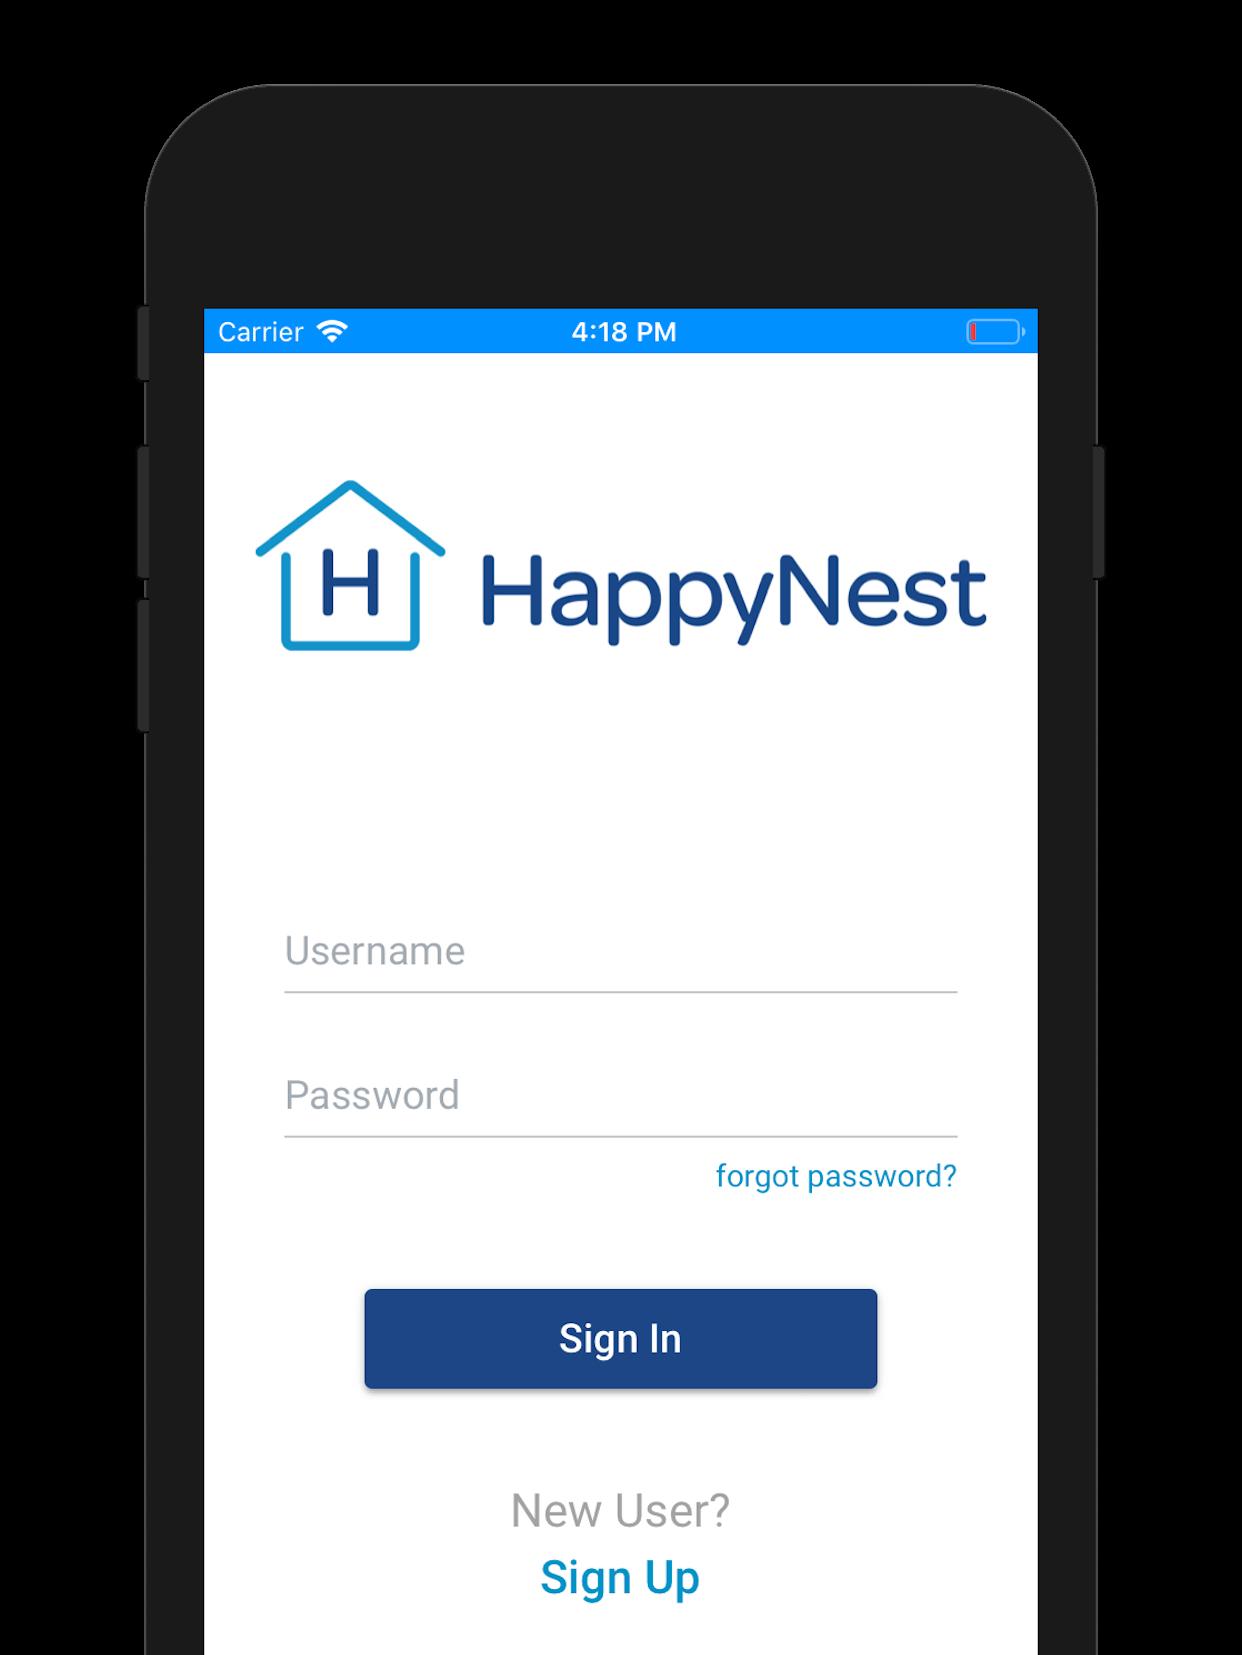 https://f.hubspotusercontent30.net/hubfs/14500231/Imported_Blog_Media/happynest-ios-app.png